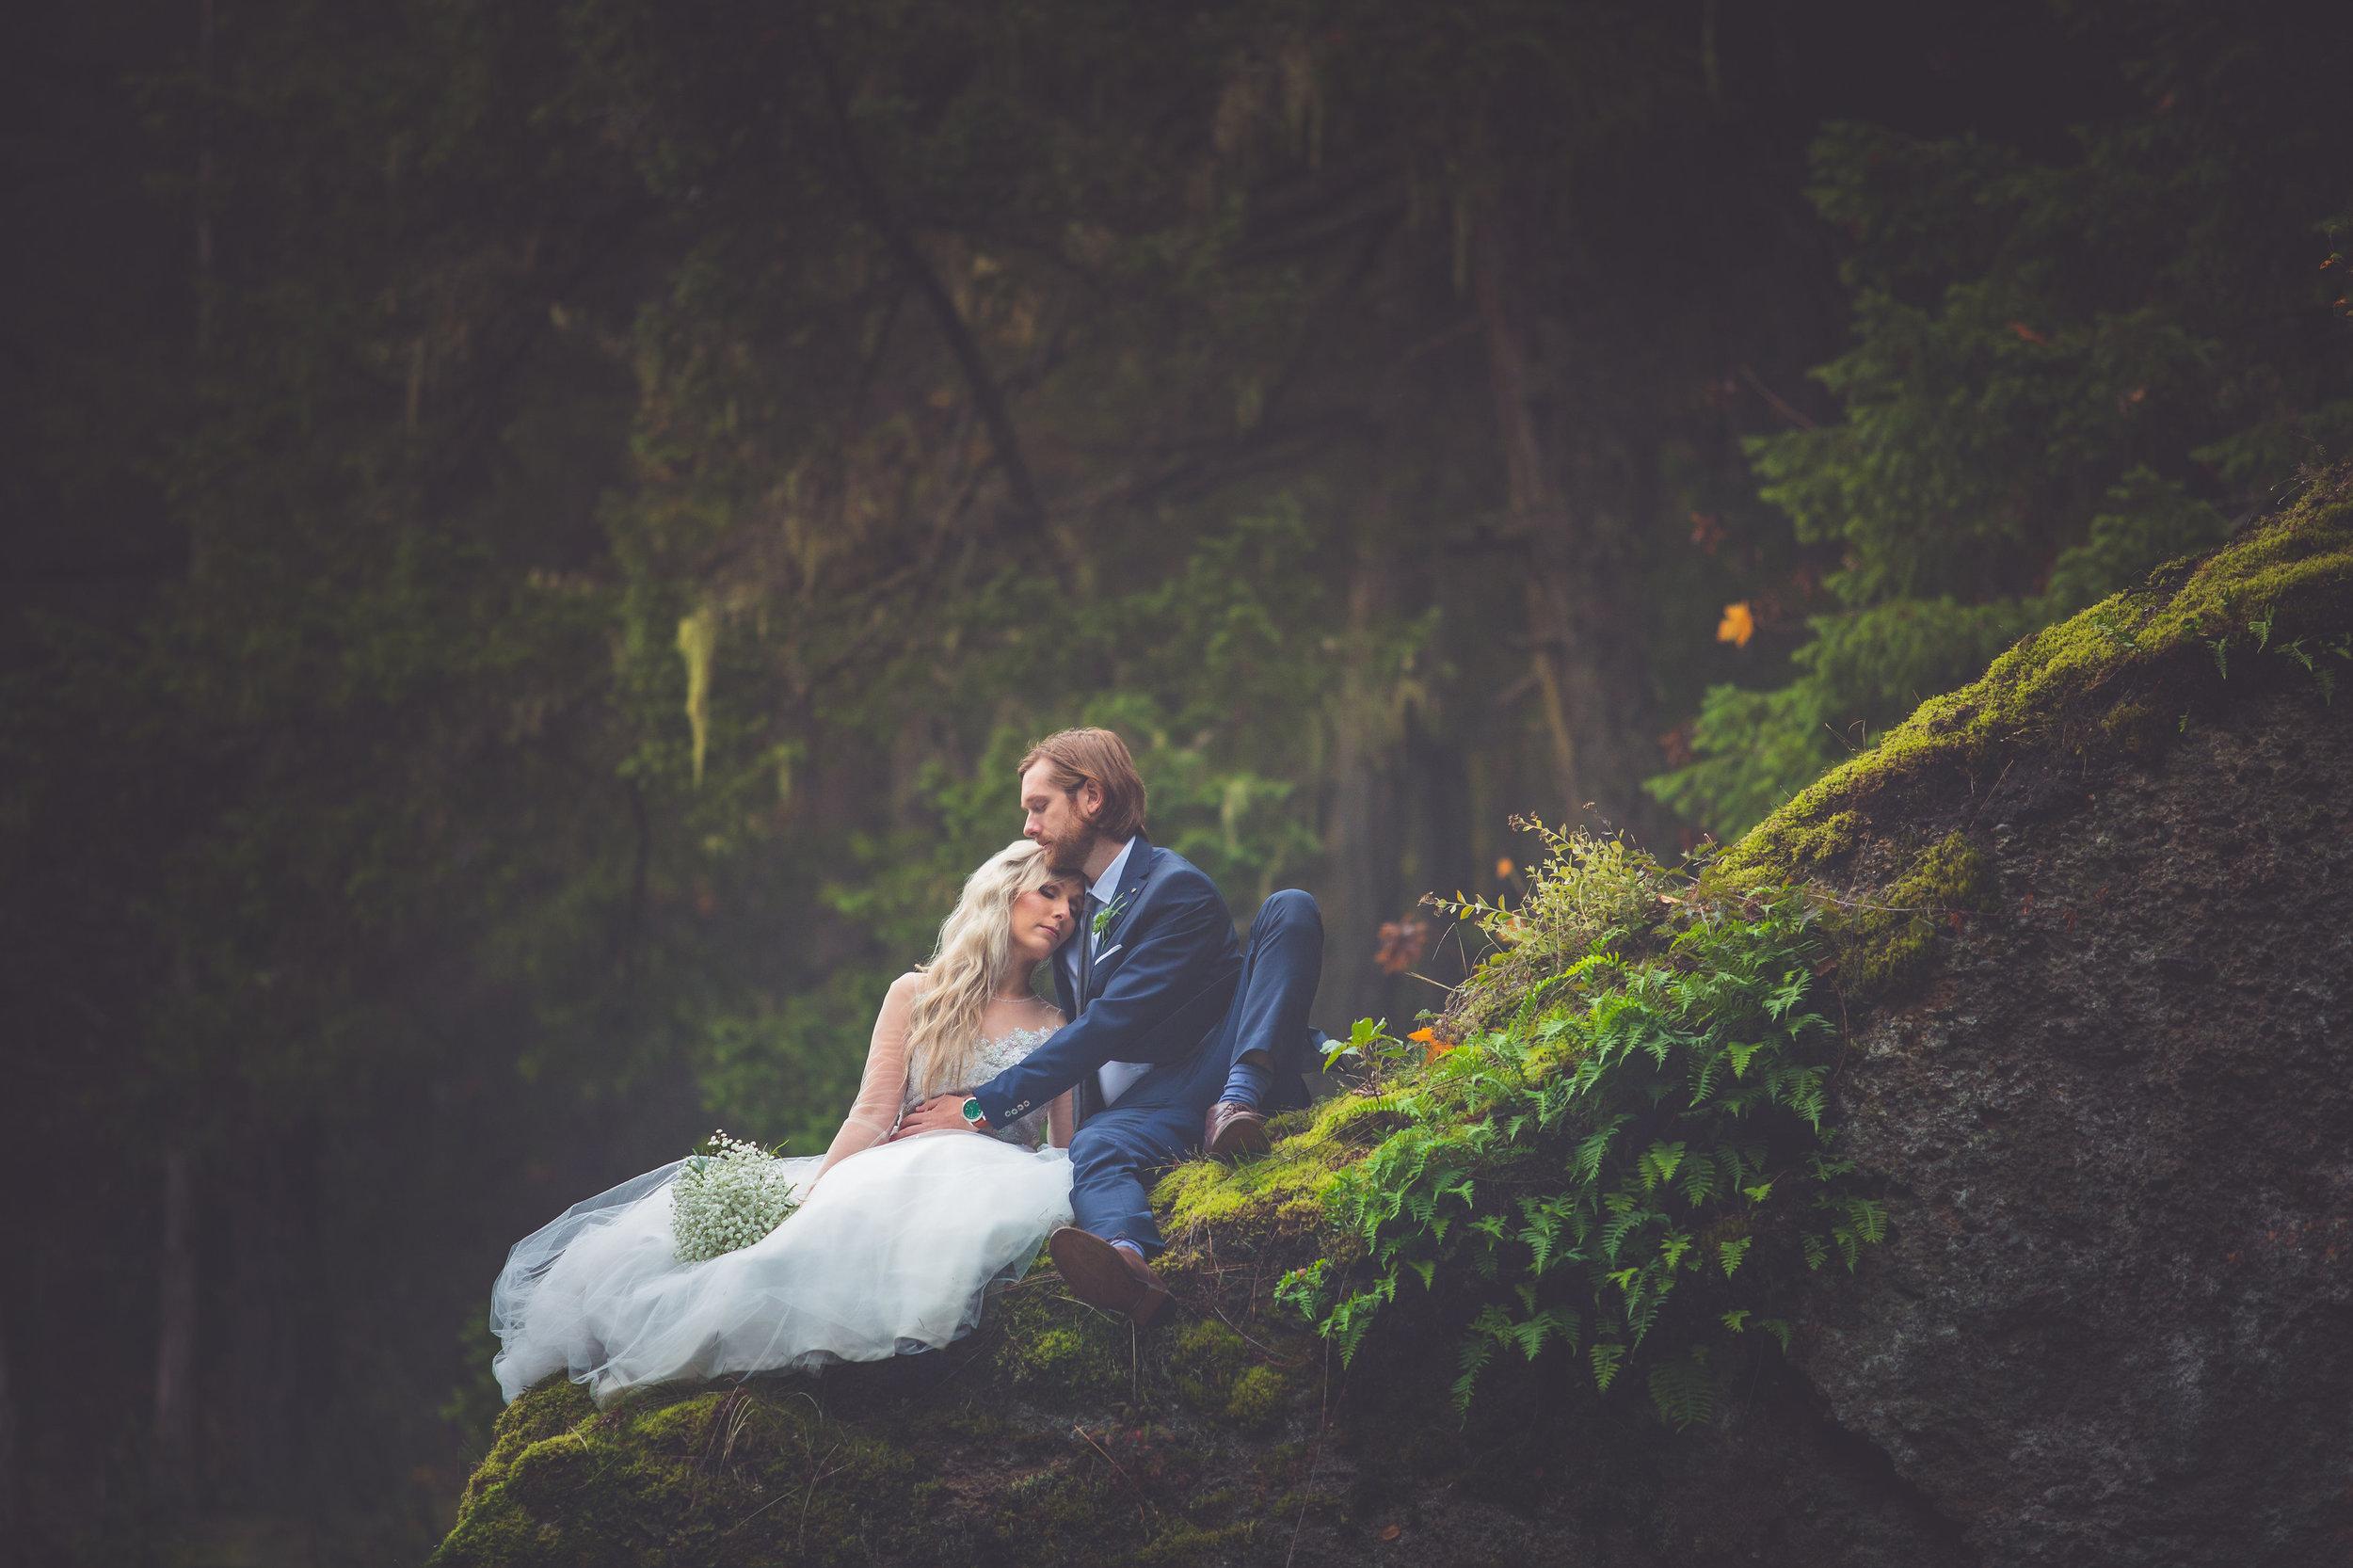 whimsical-romantic-wedding-top-bridge-40.jpg